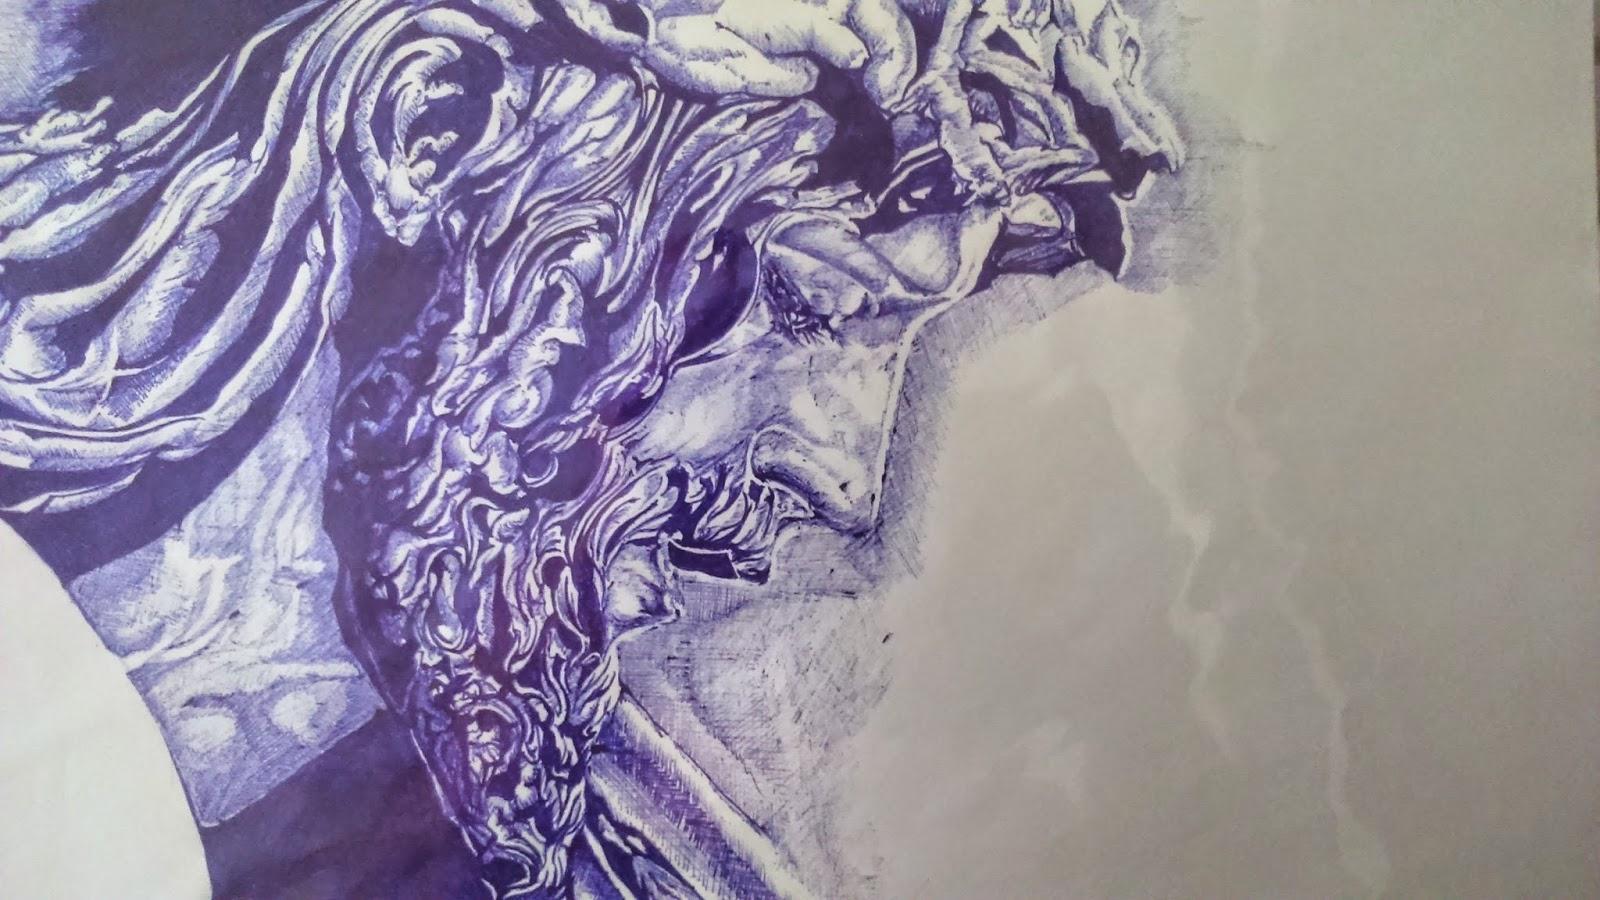 Semana Santa Sevilla Colorear: DIBUJOS A BOLIGRAFO S.GRUESO: IMAGENES DE LA SEMANA SANTA